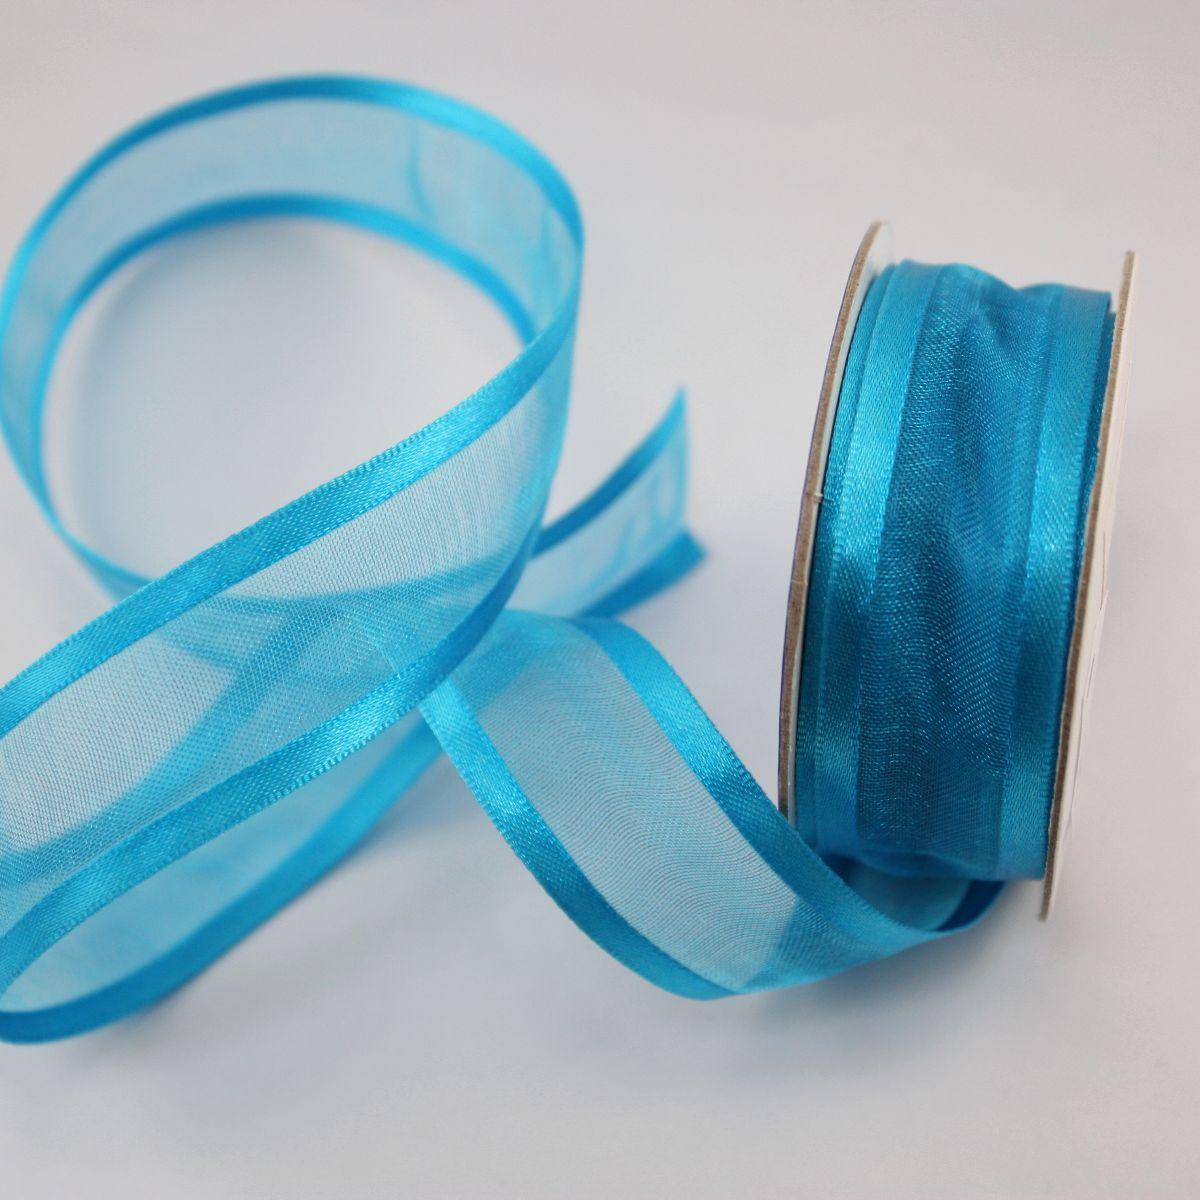 Ruban fantaisie en bobine bleu azur 20 mm